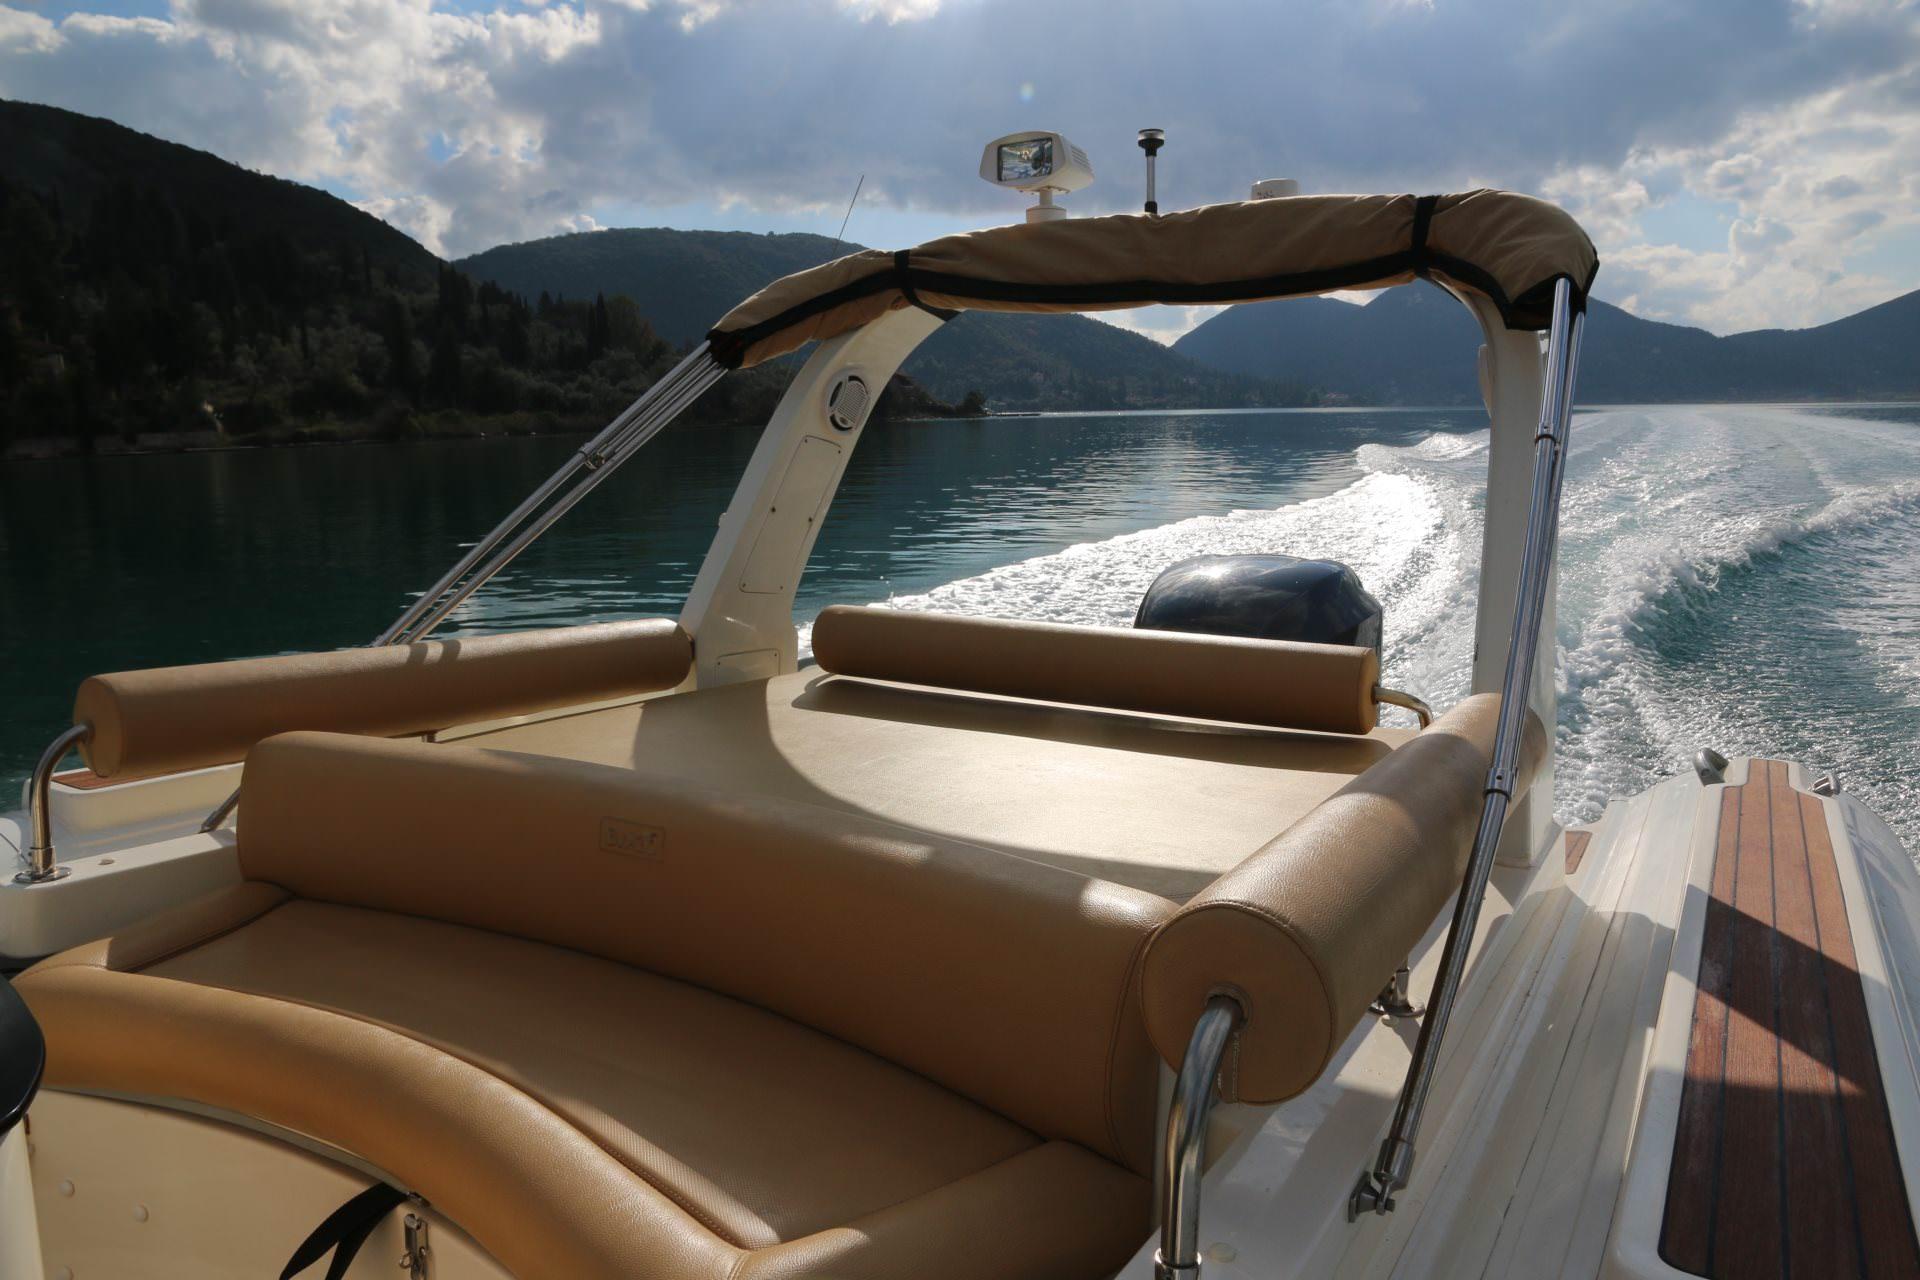 joy5 (4) - Trident Boats